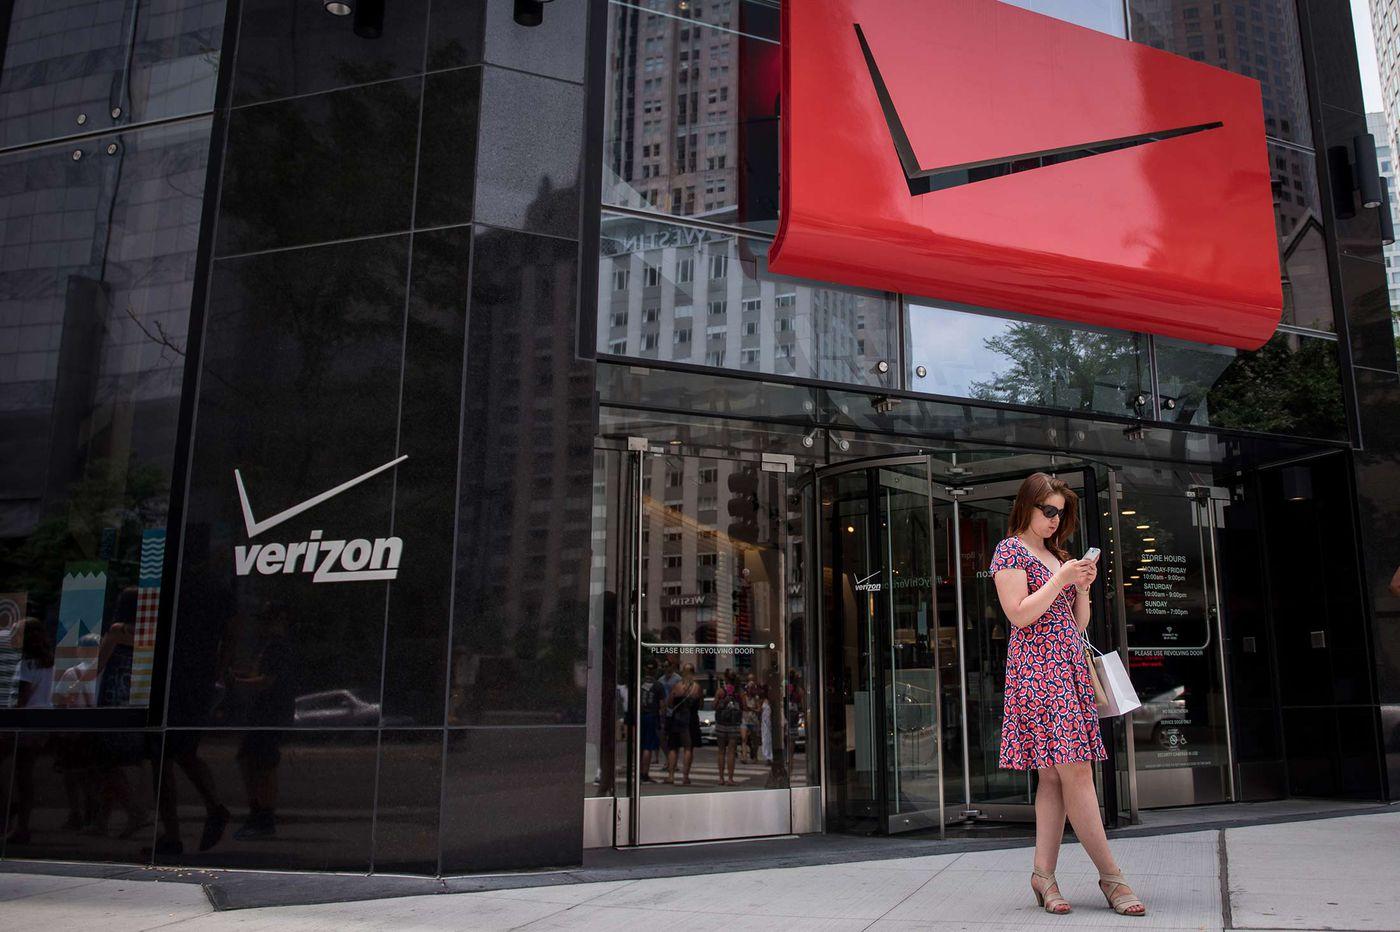 Verizon admits defeat with $4.6 Billion AOL-Yahoo write-down